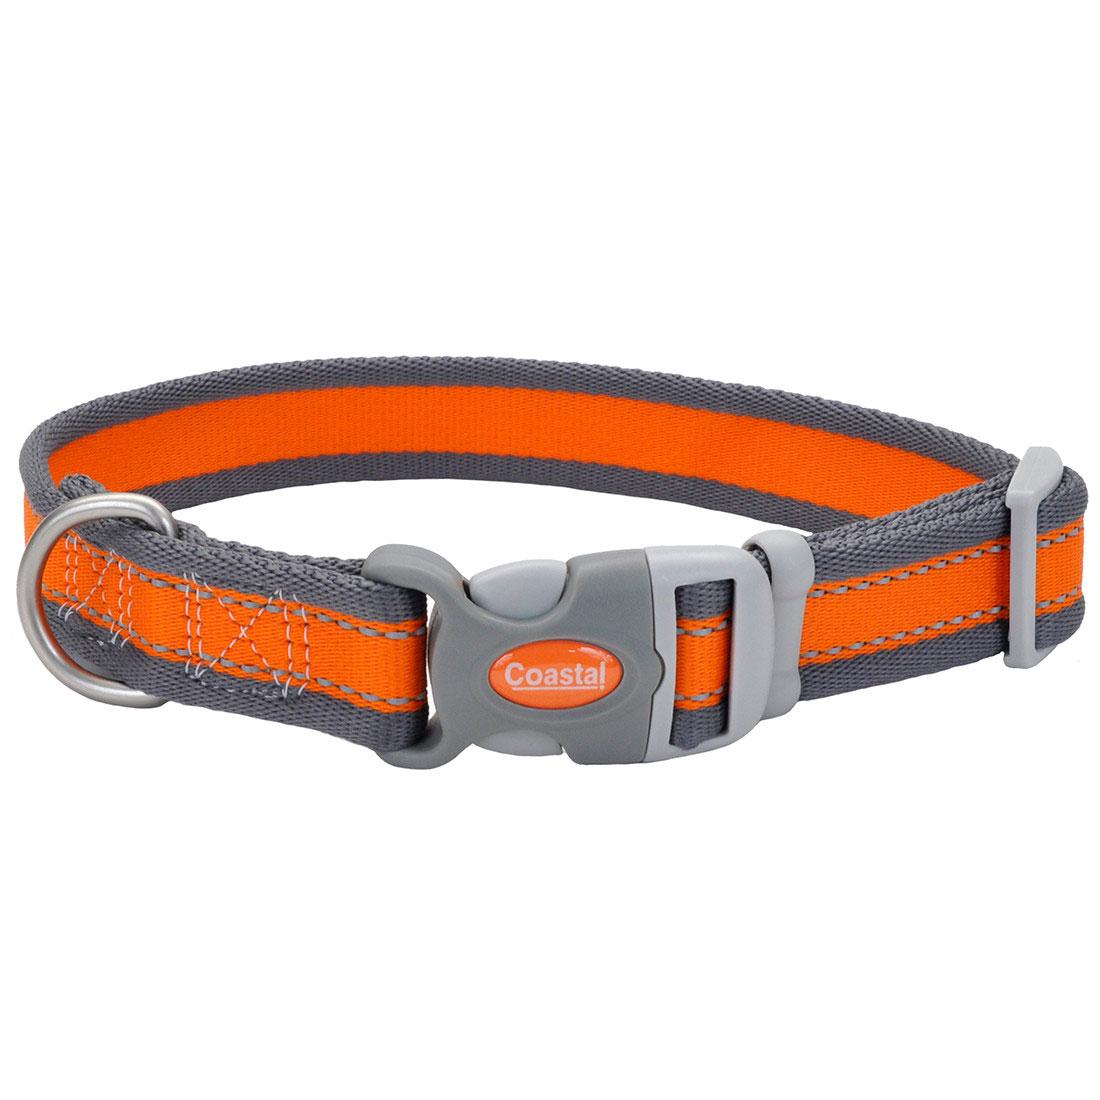 Pro Reflective Adjustable Dog Collar, Bright Orange with Grey Image